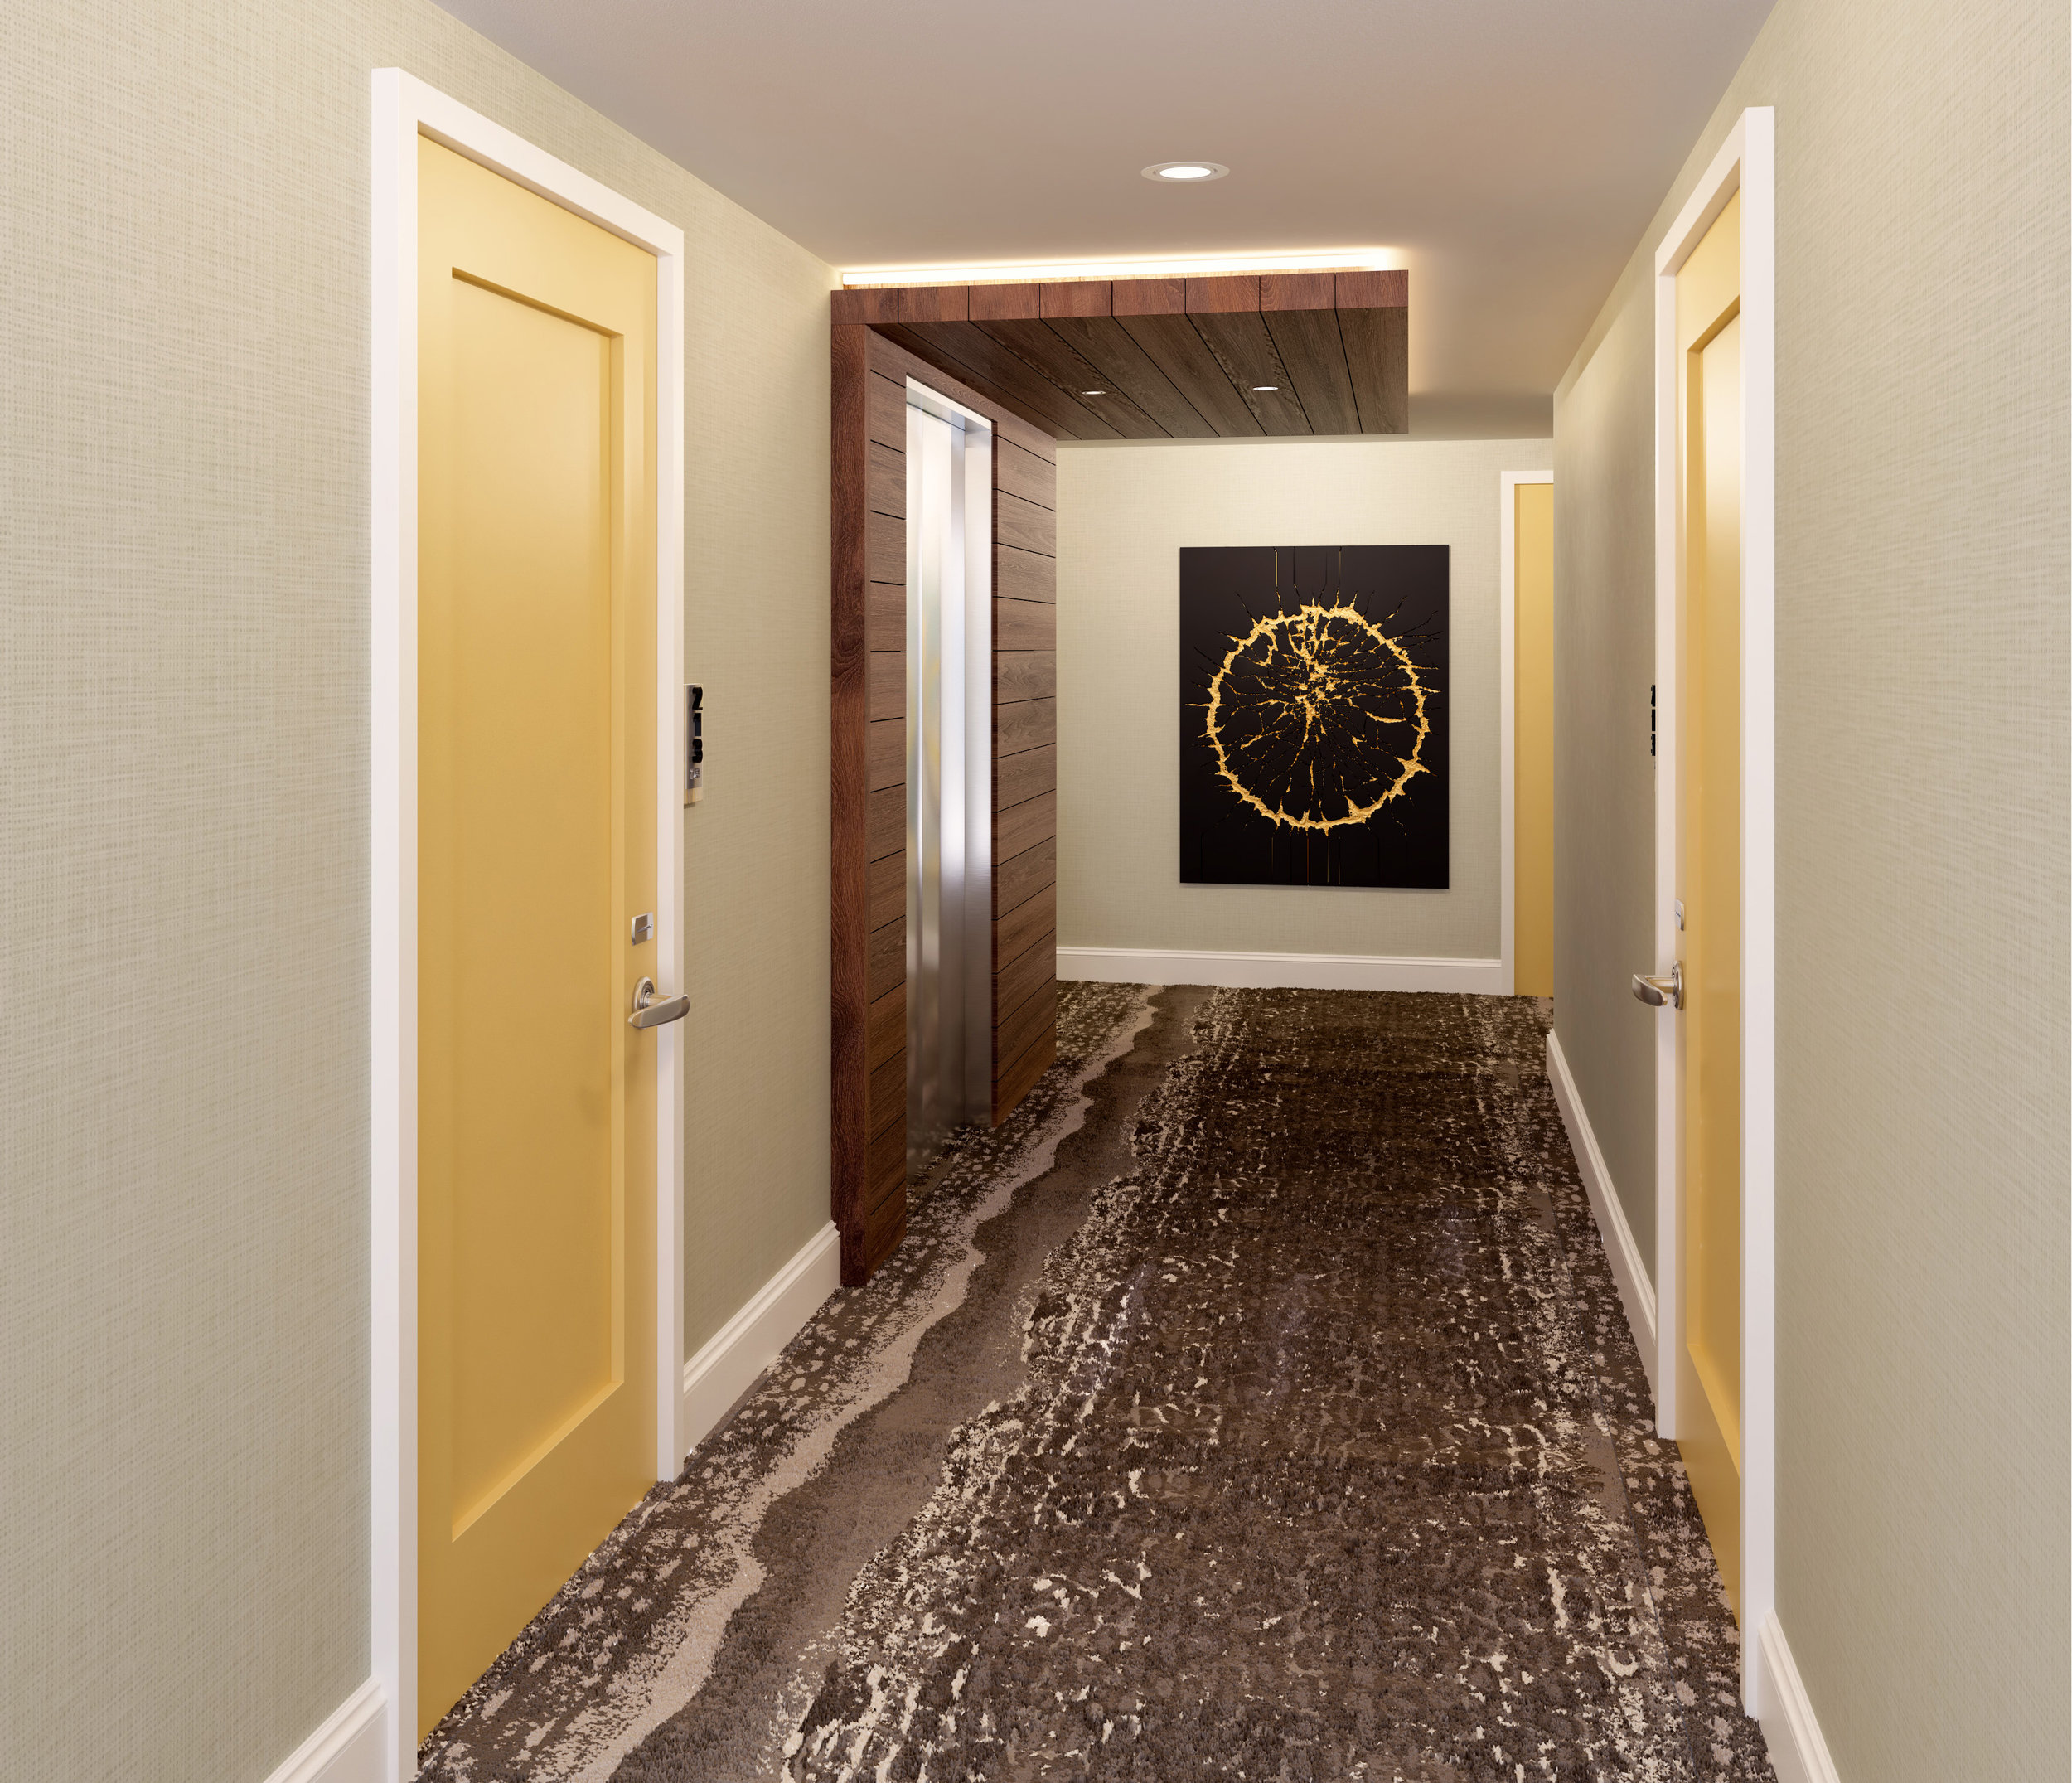 Corridor at Delta Hotel Daytona Shores, in Daytona Beach, FL, Designed by Design Poole, Inc in Winter Park Florida